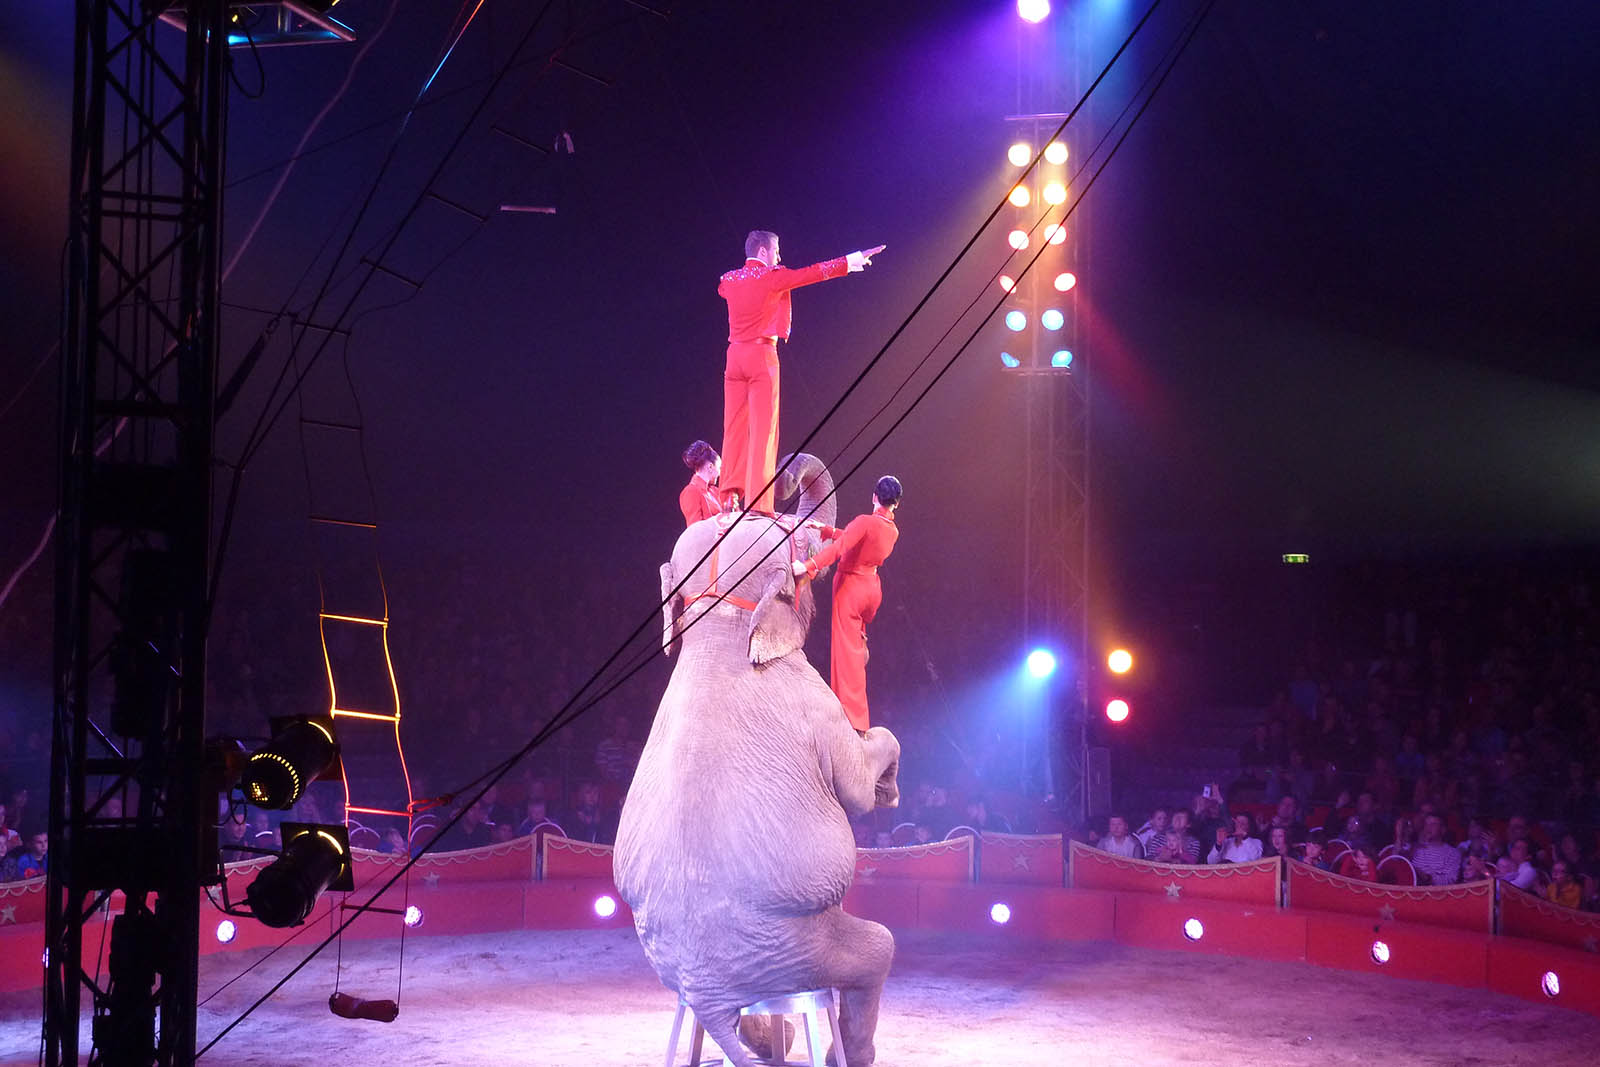 Zirkus Charles Knie: Alles über das Tierleid in diesem Zirkus